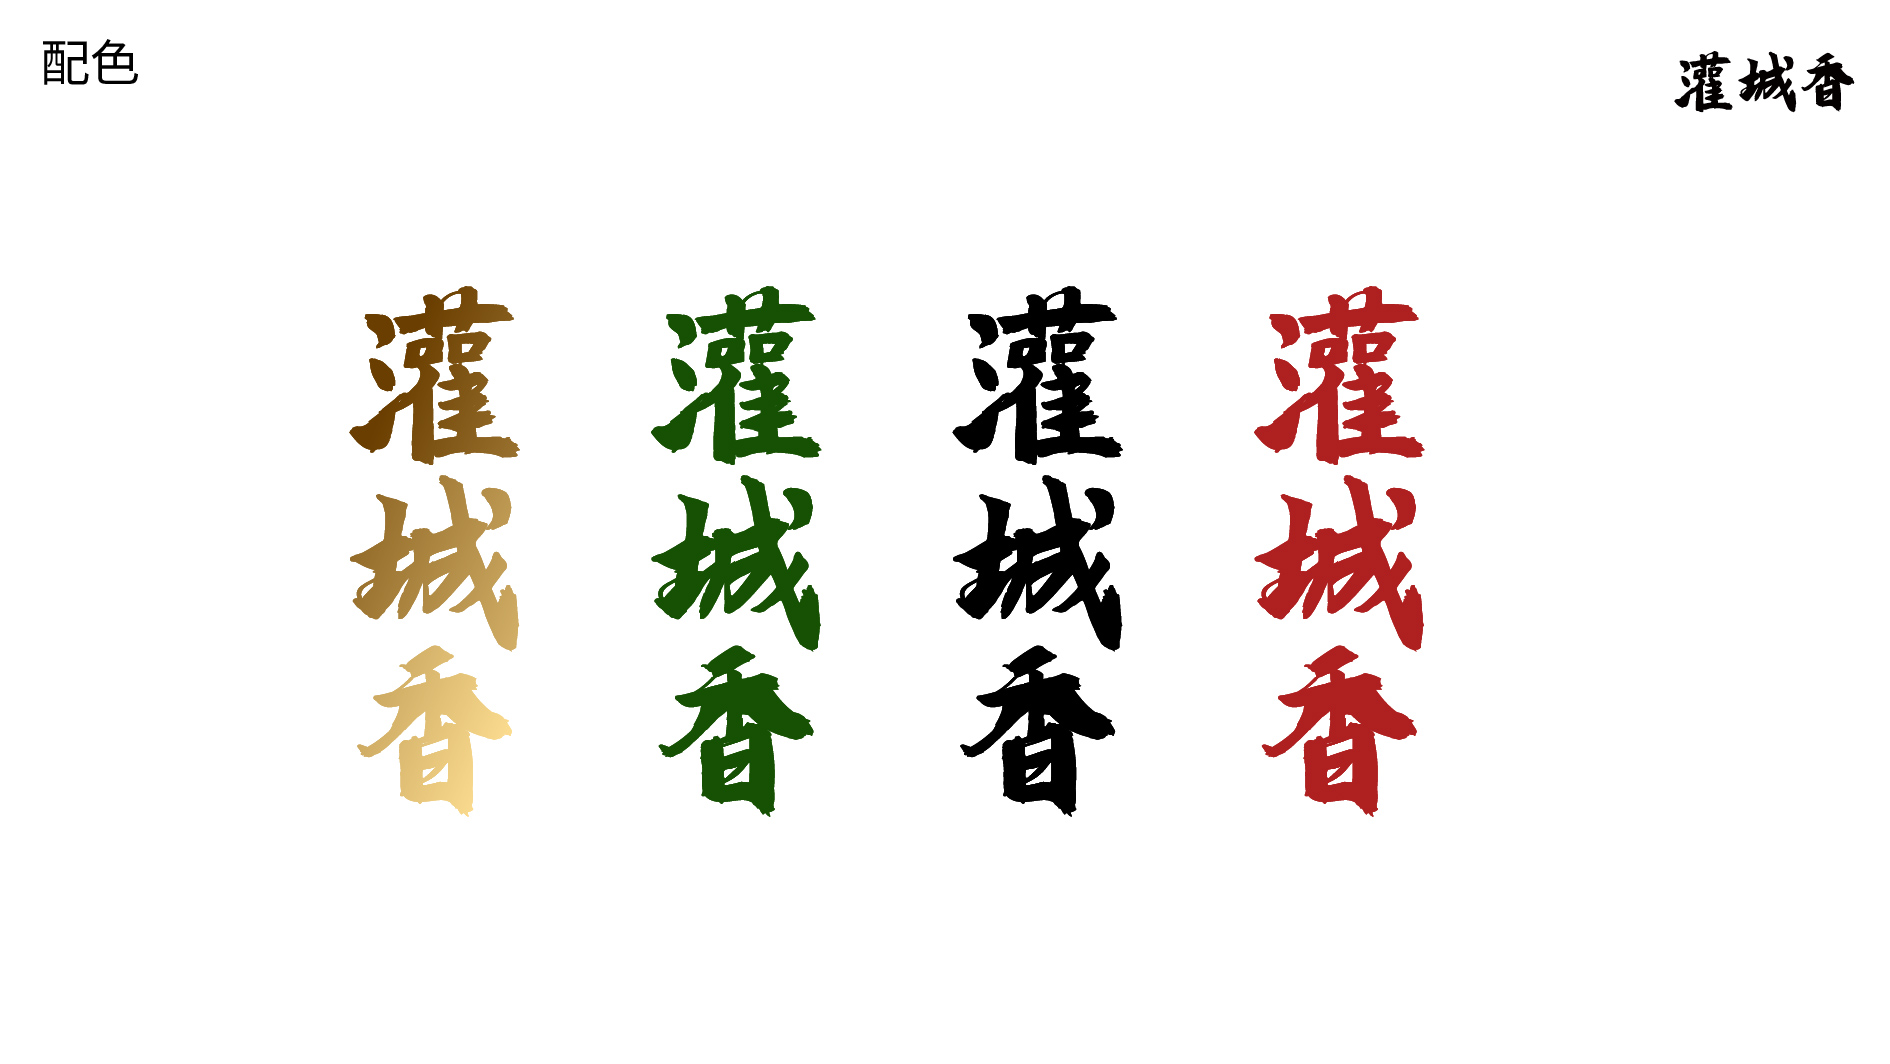 LOGO创意设计,品牌:灌城香(6.11附件有更新)_3033579_k68威客网